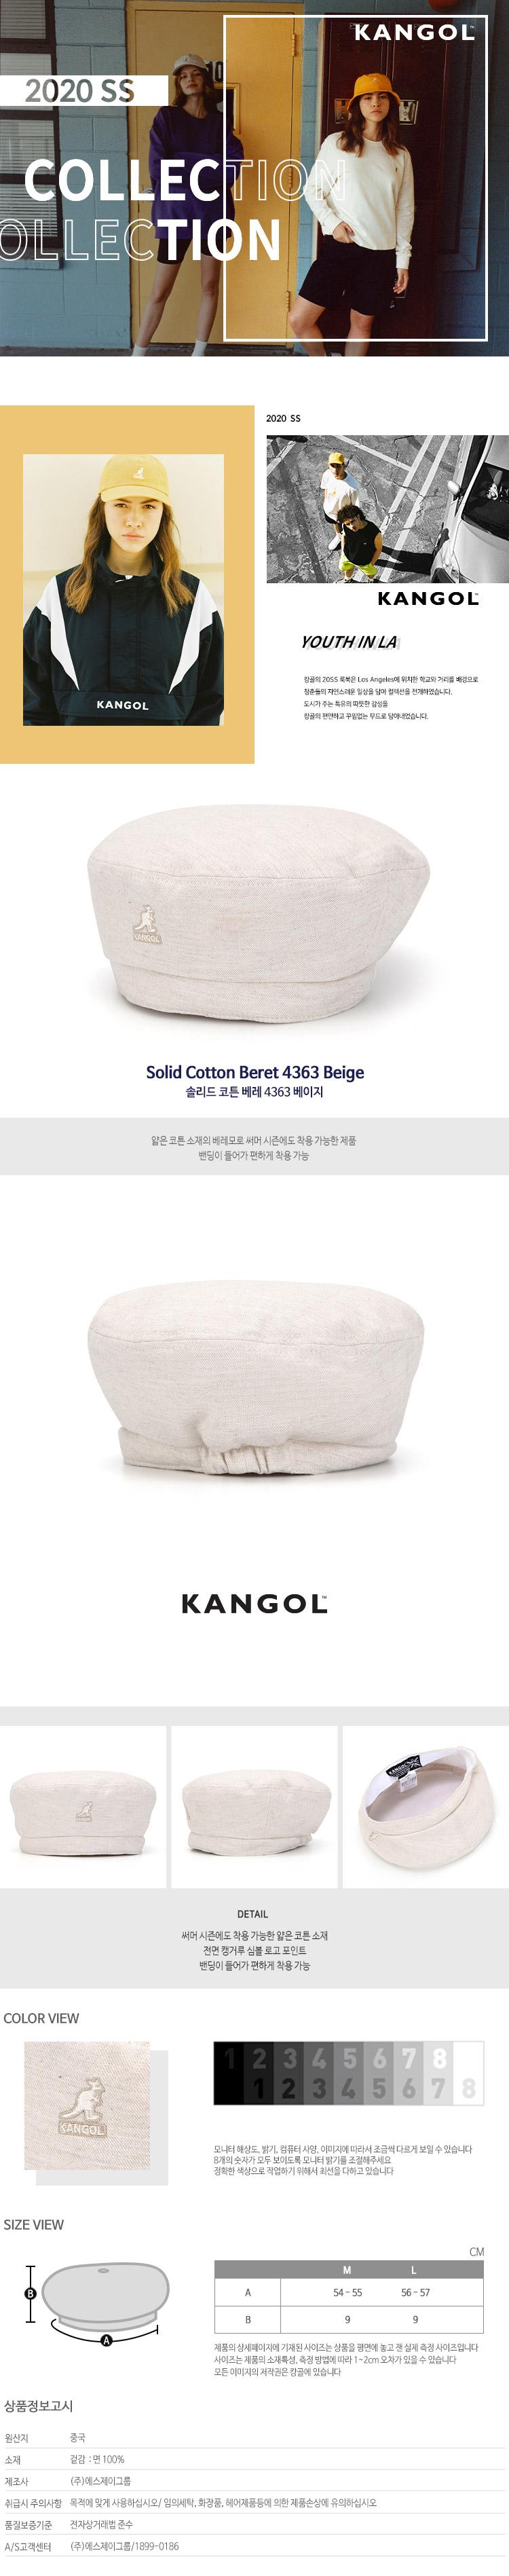 SOLID COTTON BERET 4363 BEIGE